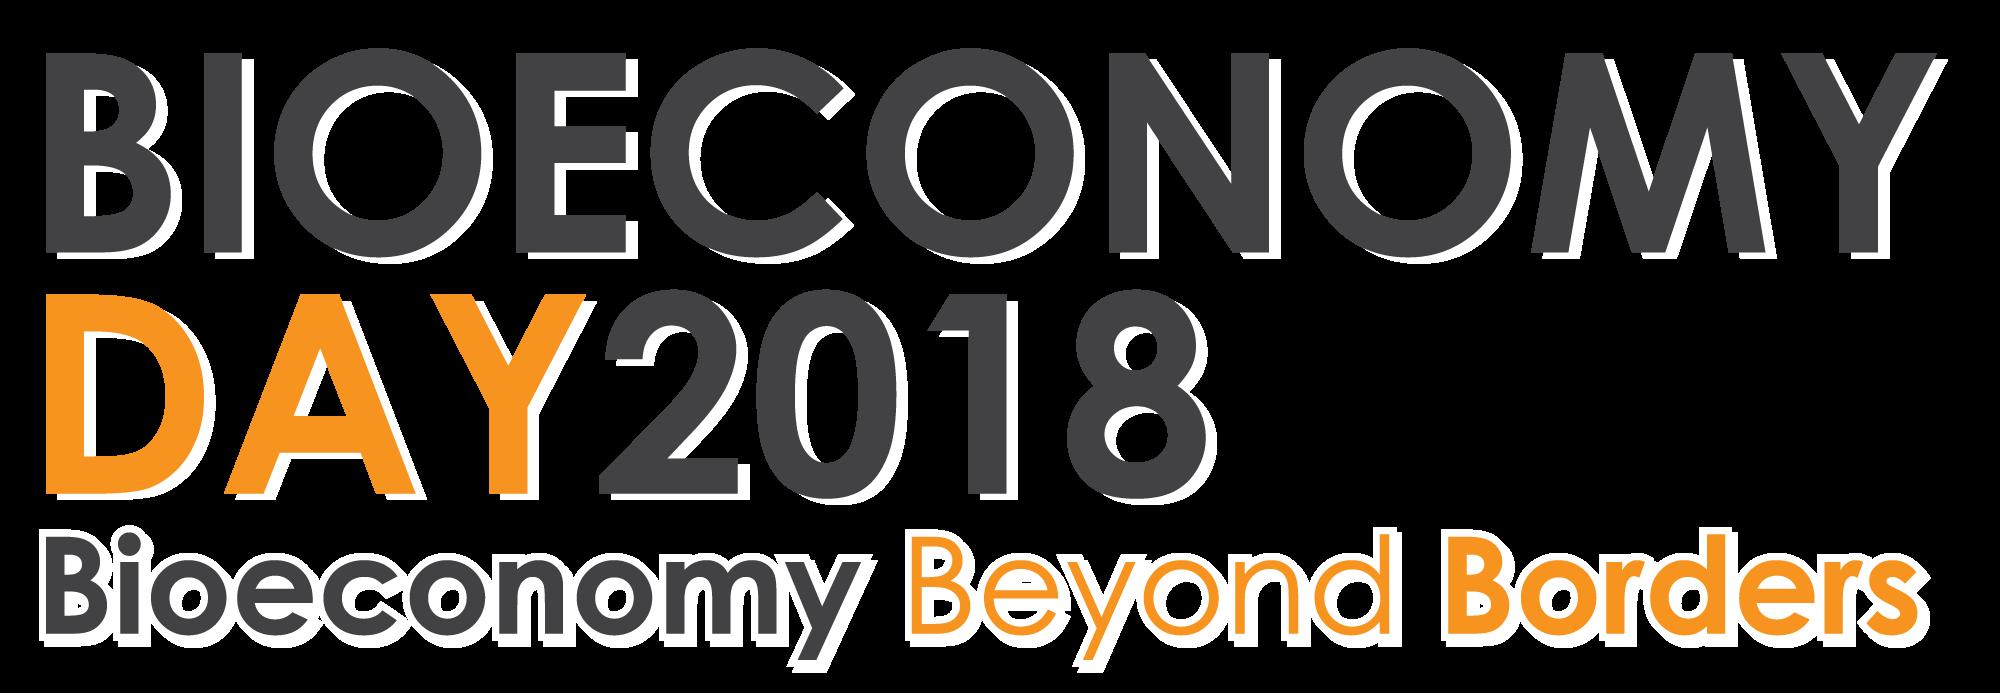 BIOECONOMY DAY SEPTEMBER 2018